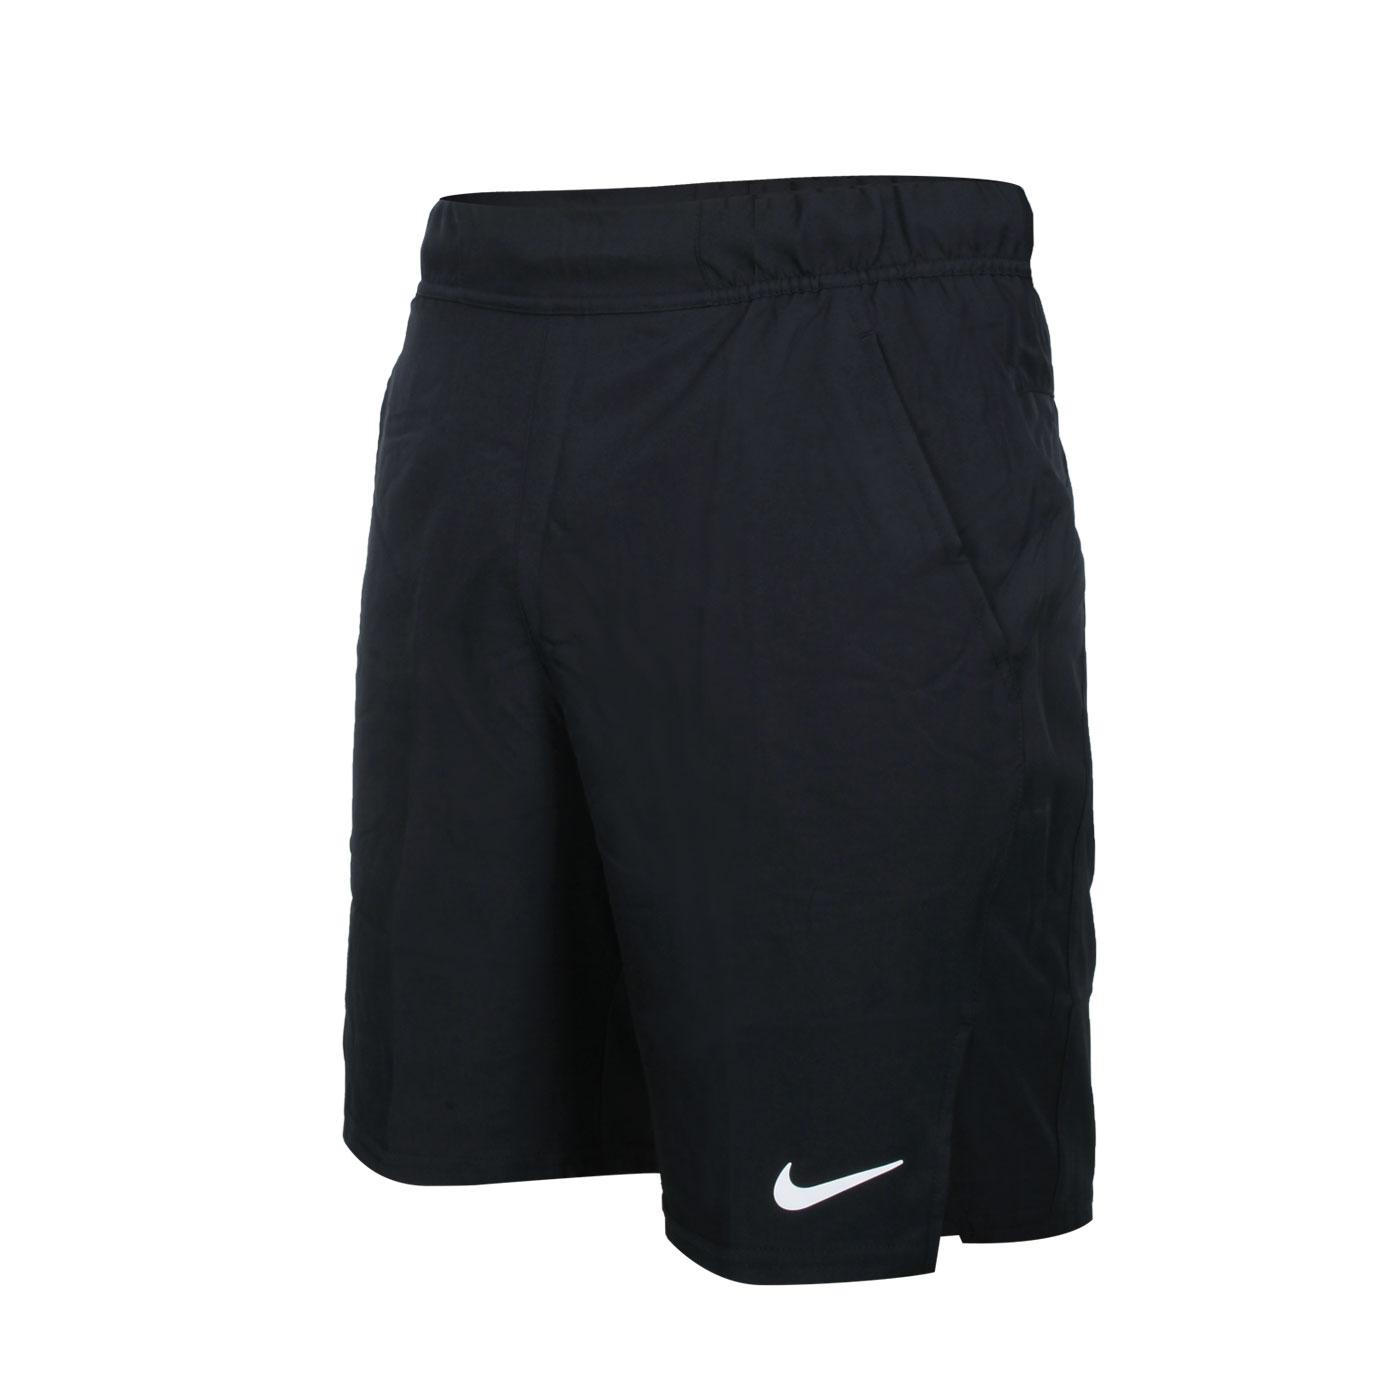 NIKE 男款運動短褲 CV2544-010 - 黑白